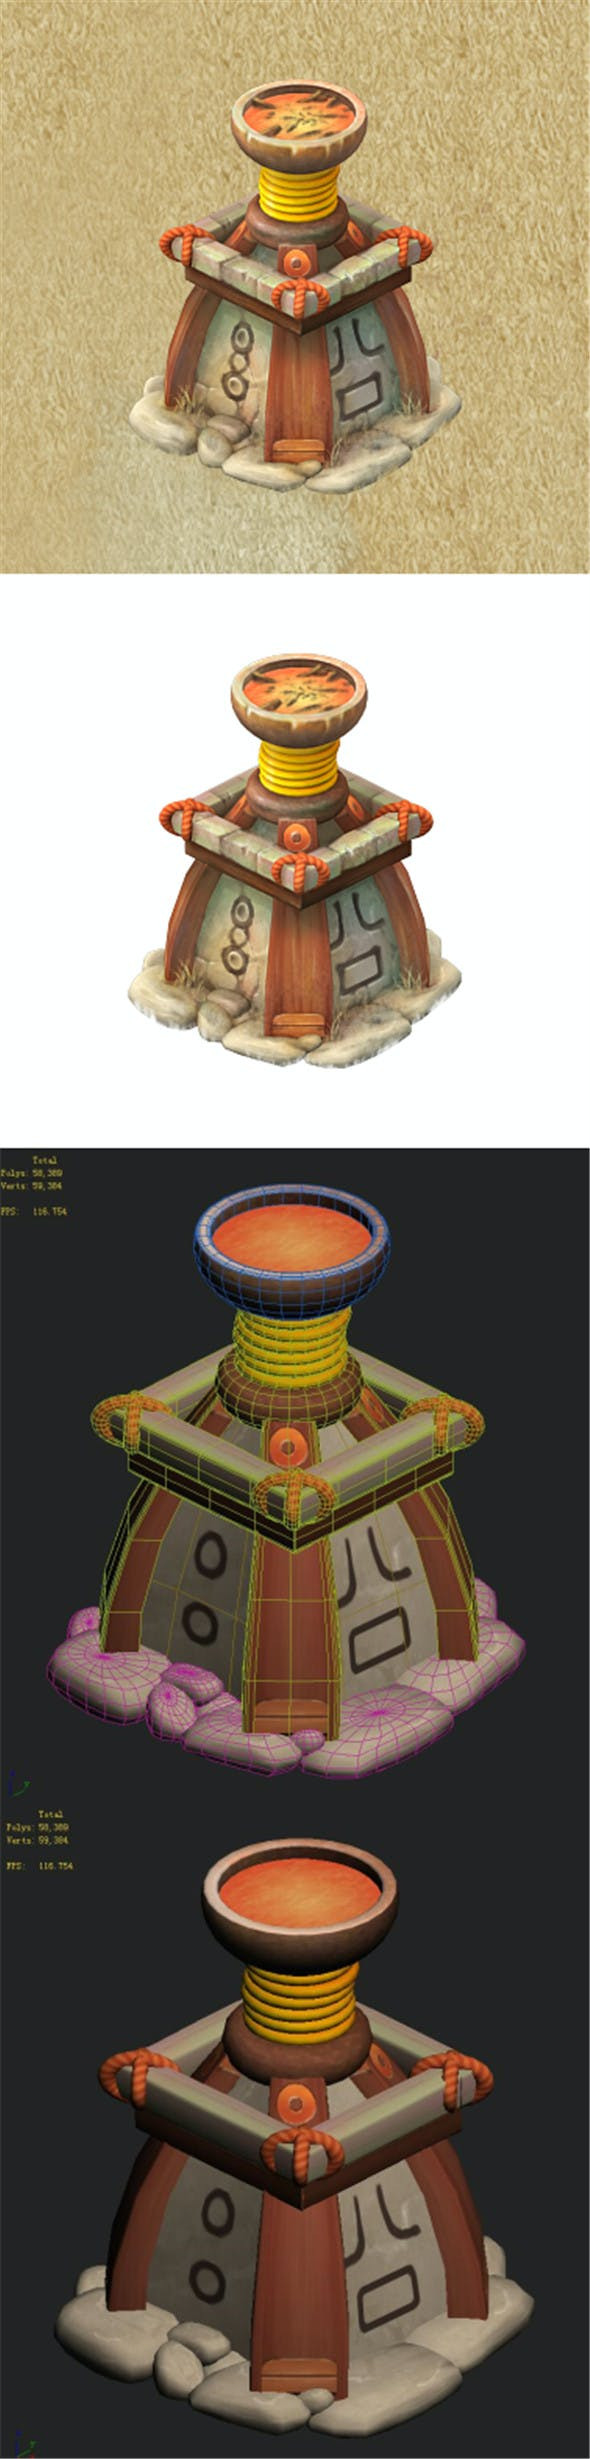 Cartoon version - God lamp - 3DOcean Item for Sale